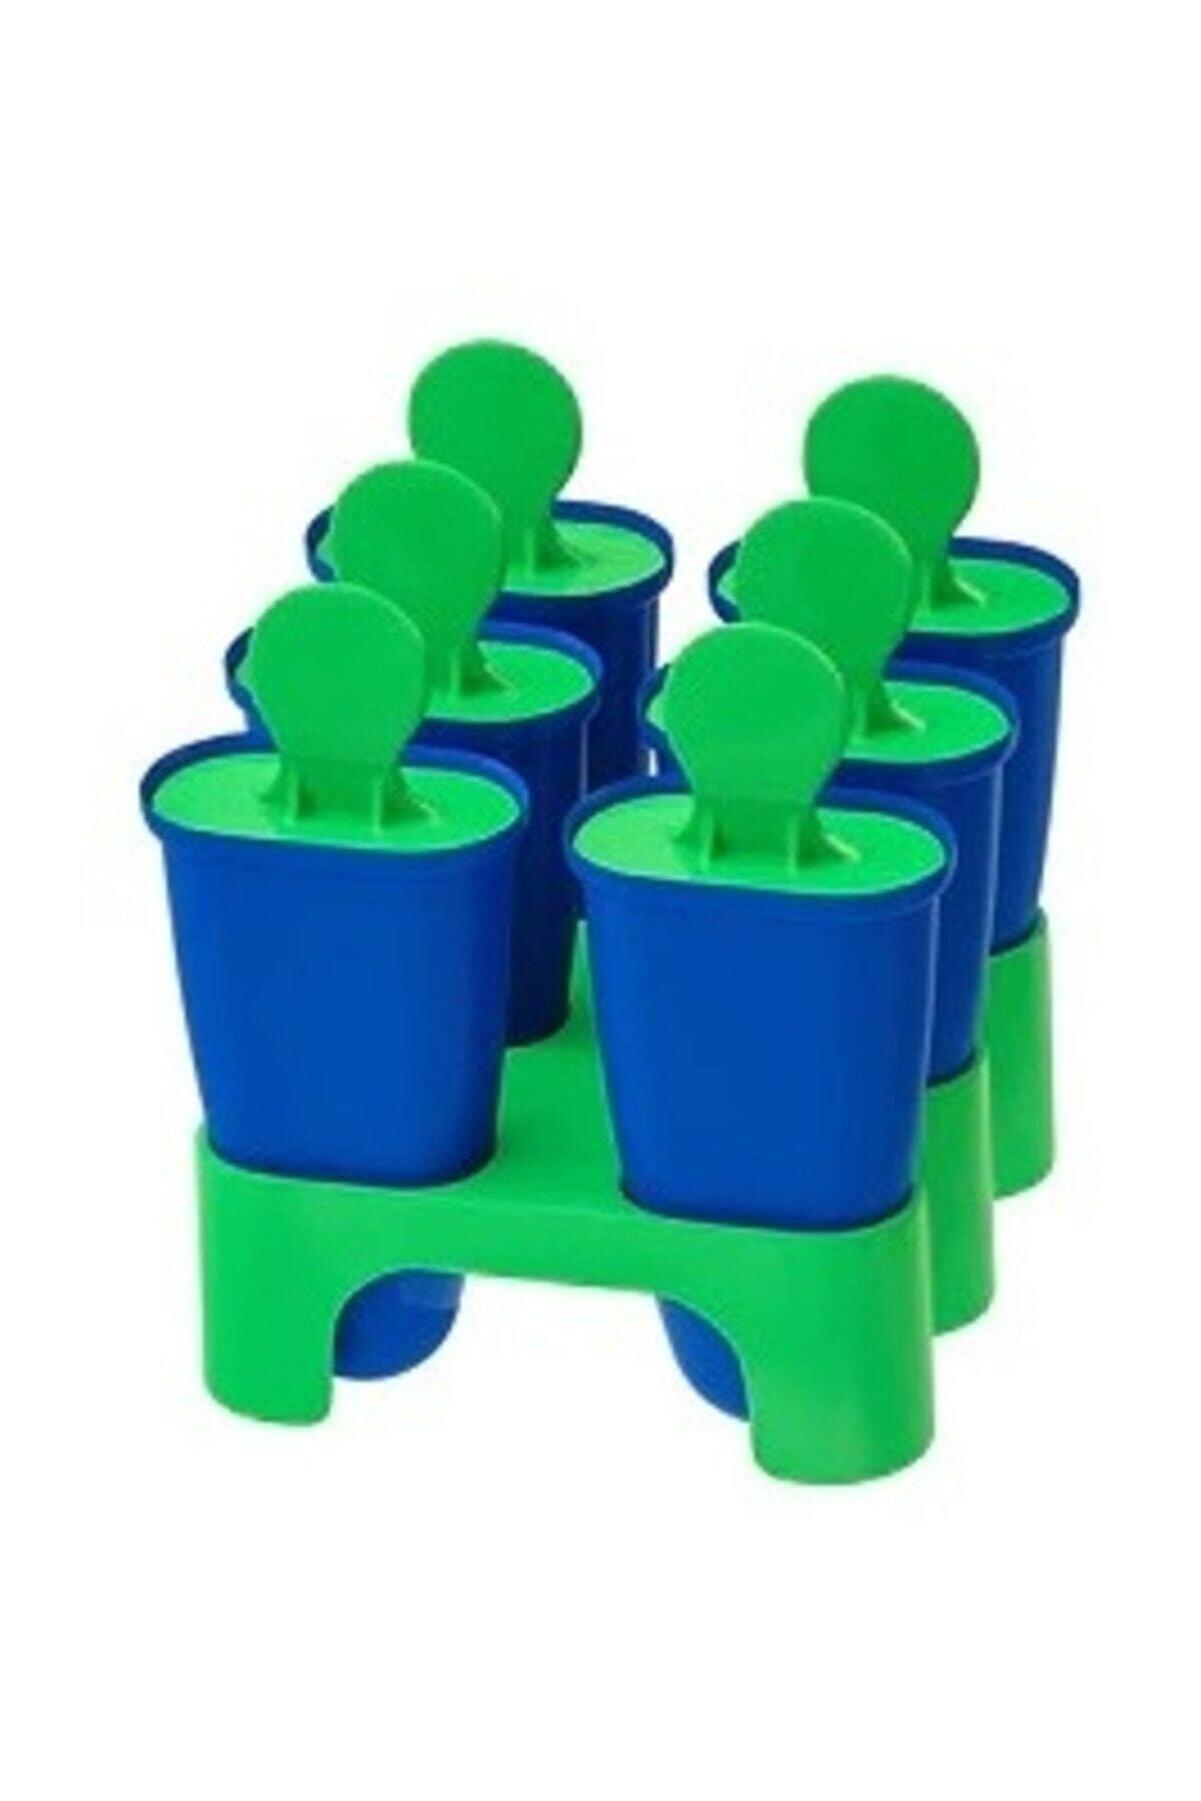 BARBUN Chosıgt Çubuk Dondurma Kalıbı 6'lı Kalıp Set Mavi